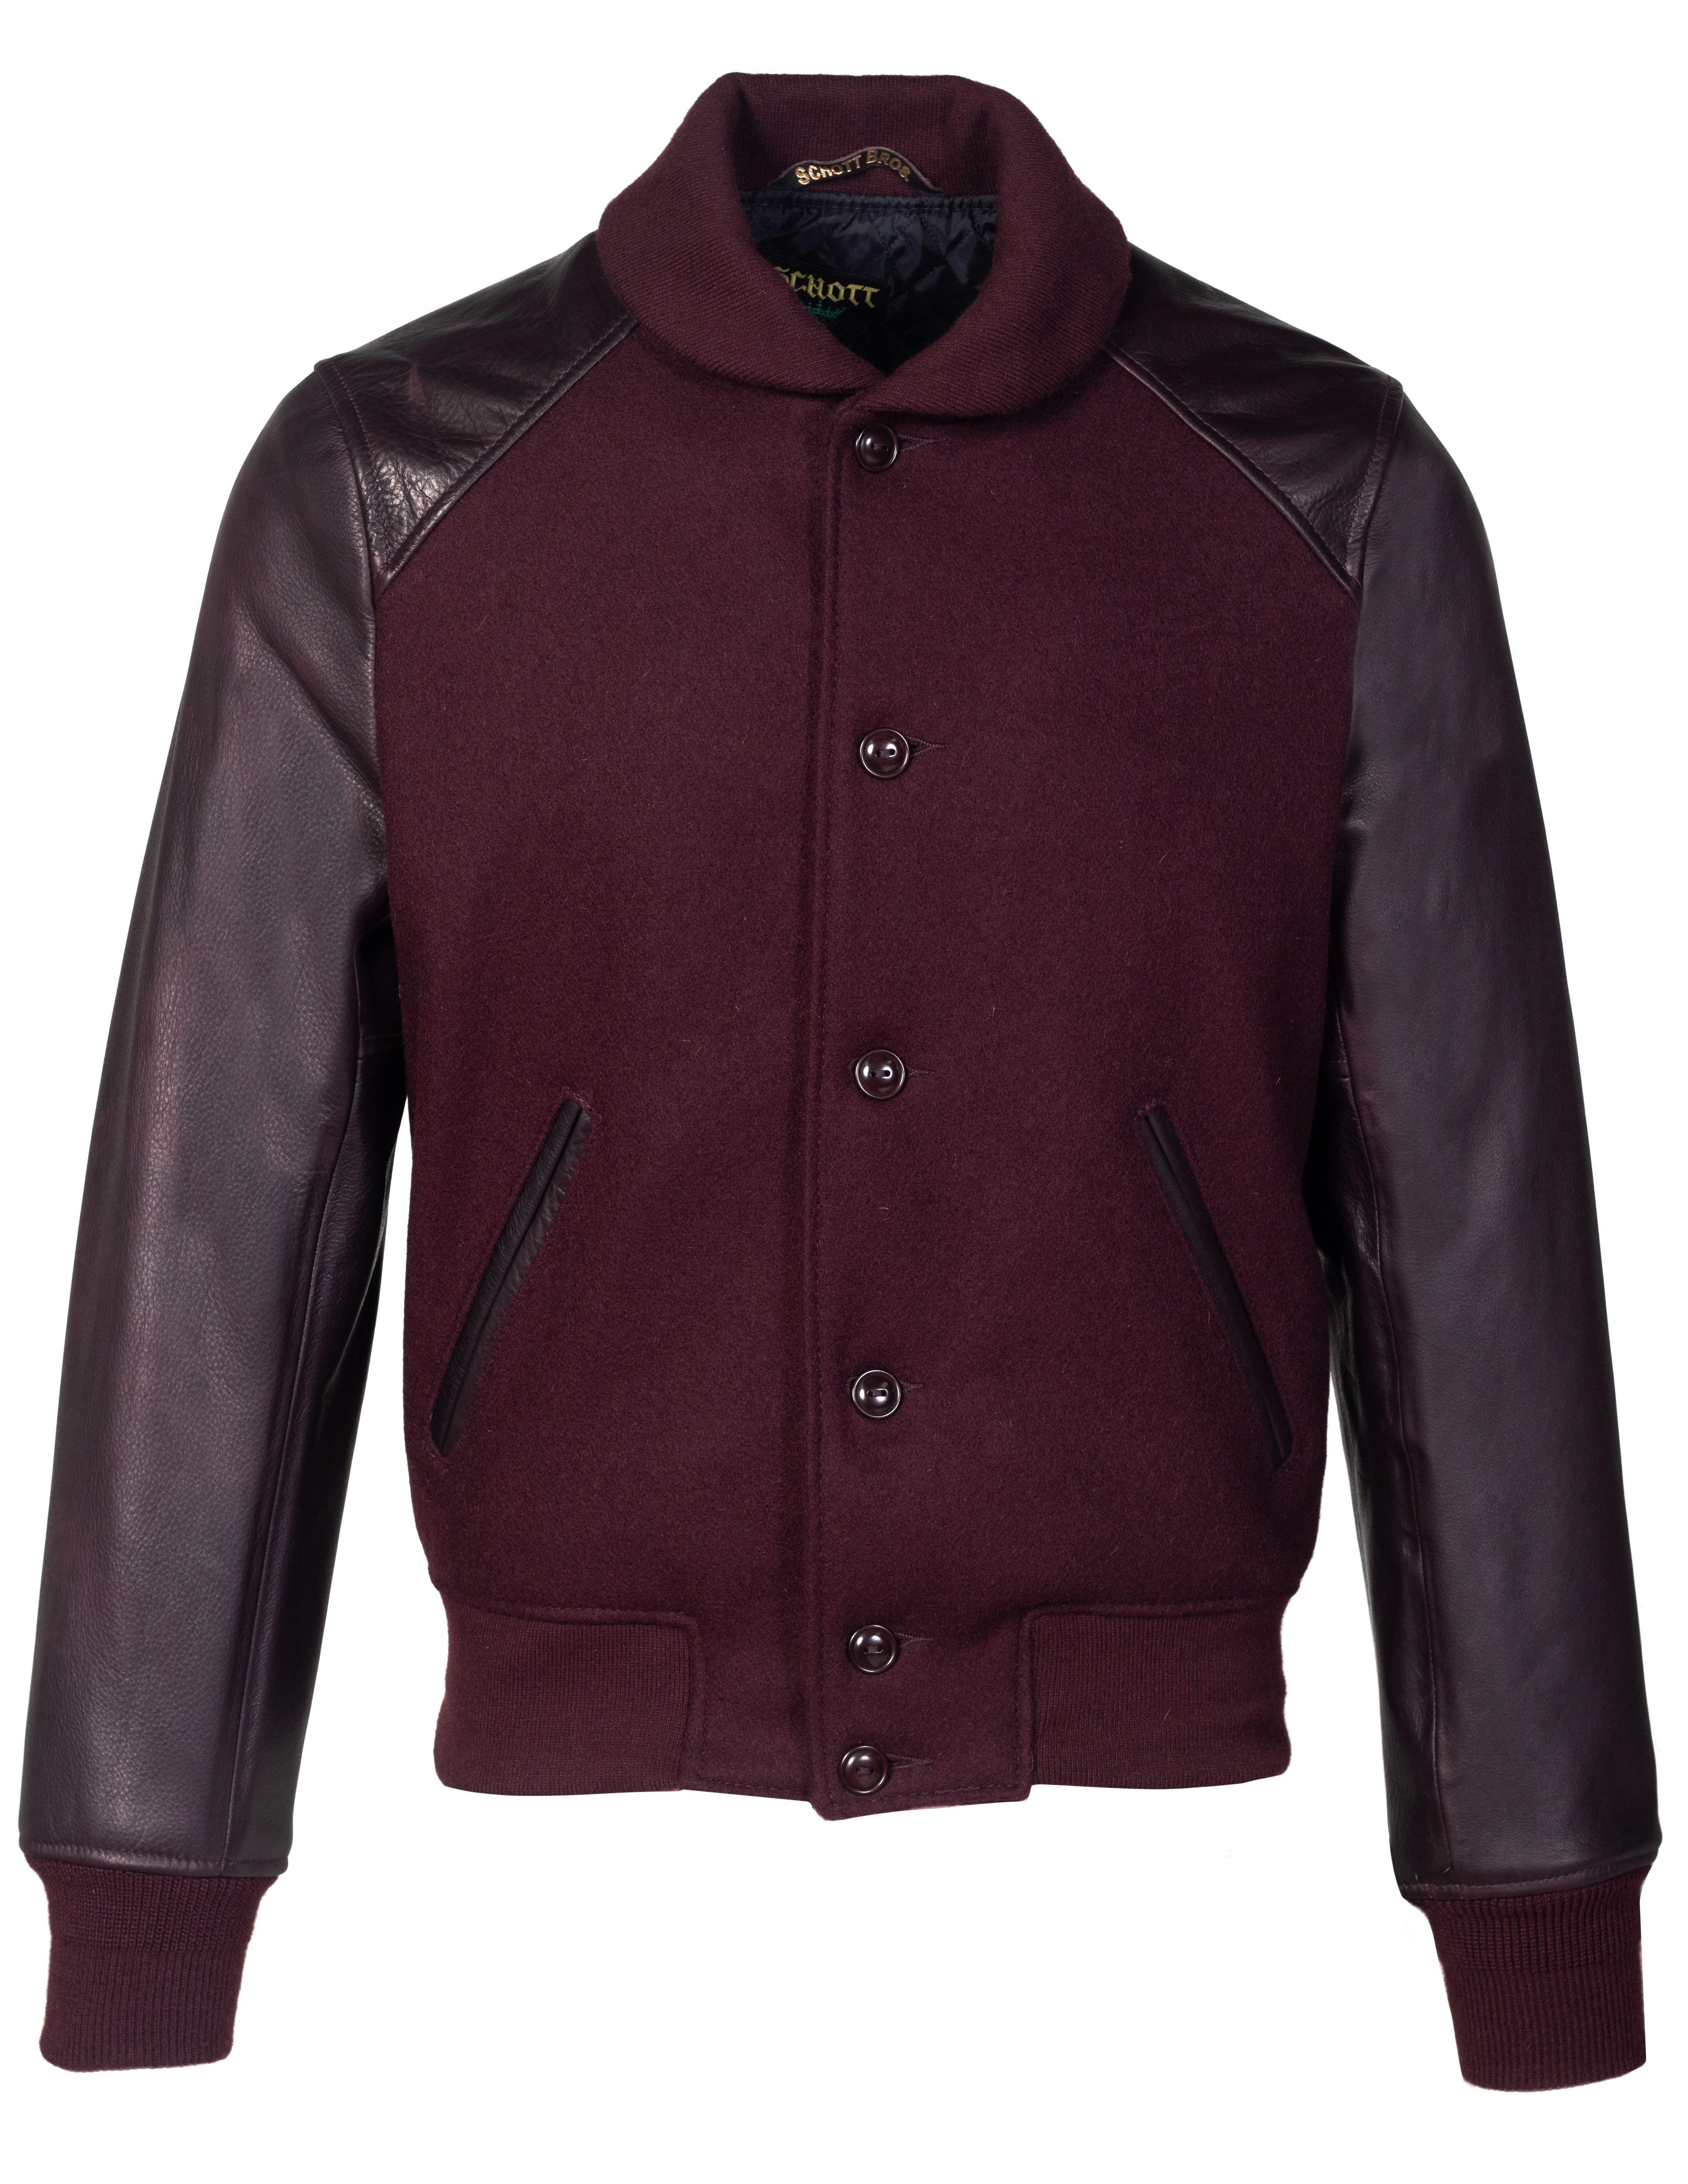 62f415bd4 Schott N.Y.C. 770 Men's Melton Wool 70's Varsity Jacket with Leather  Sleeves - Burgundy Size XS